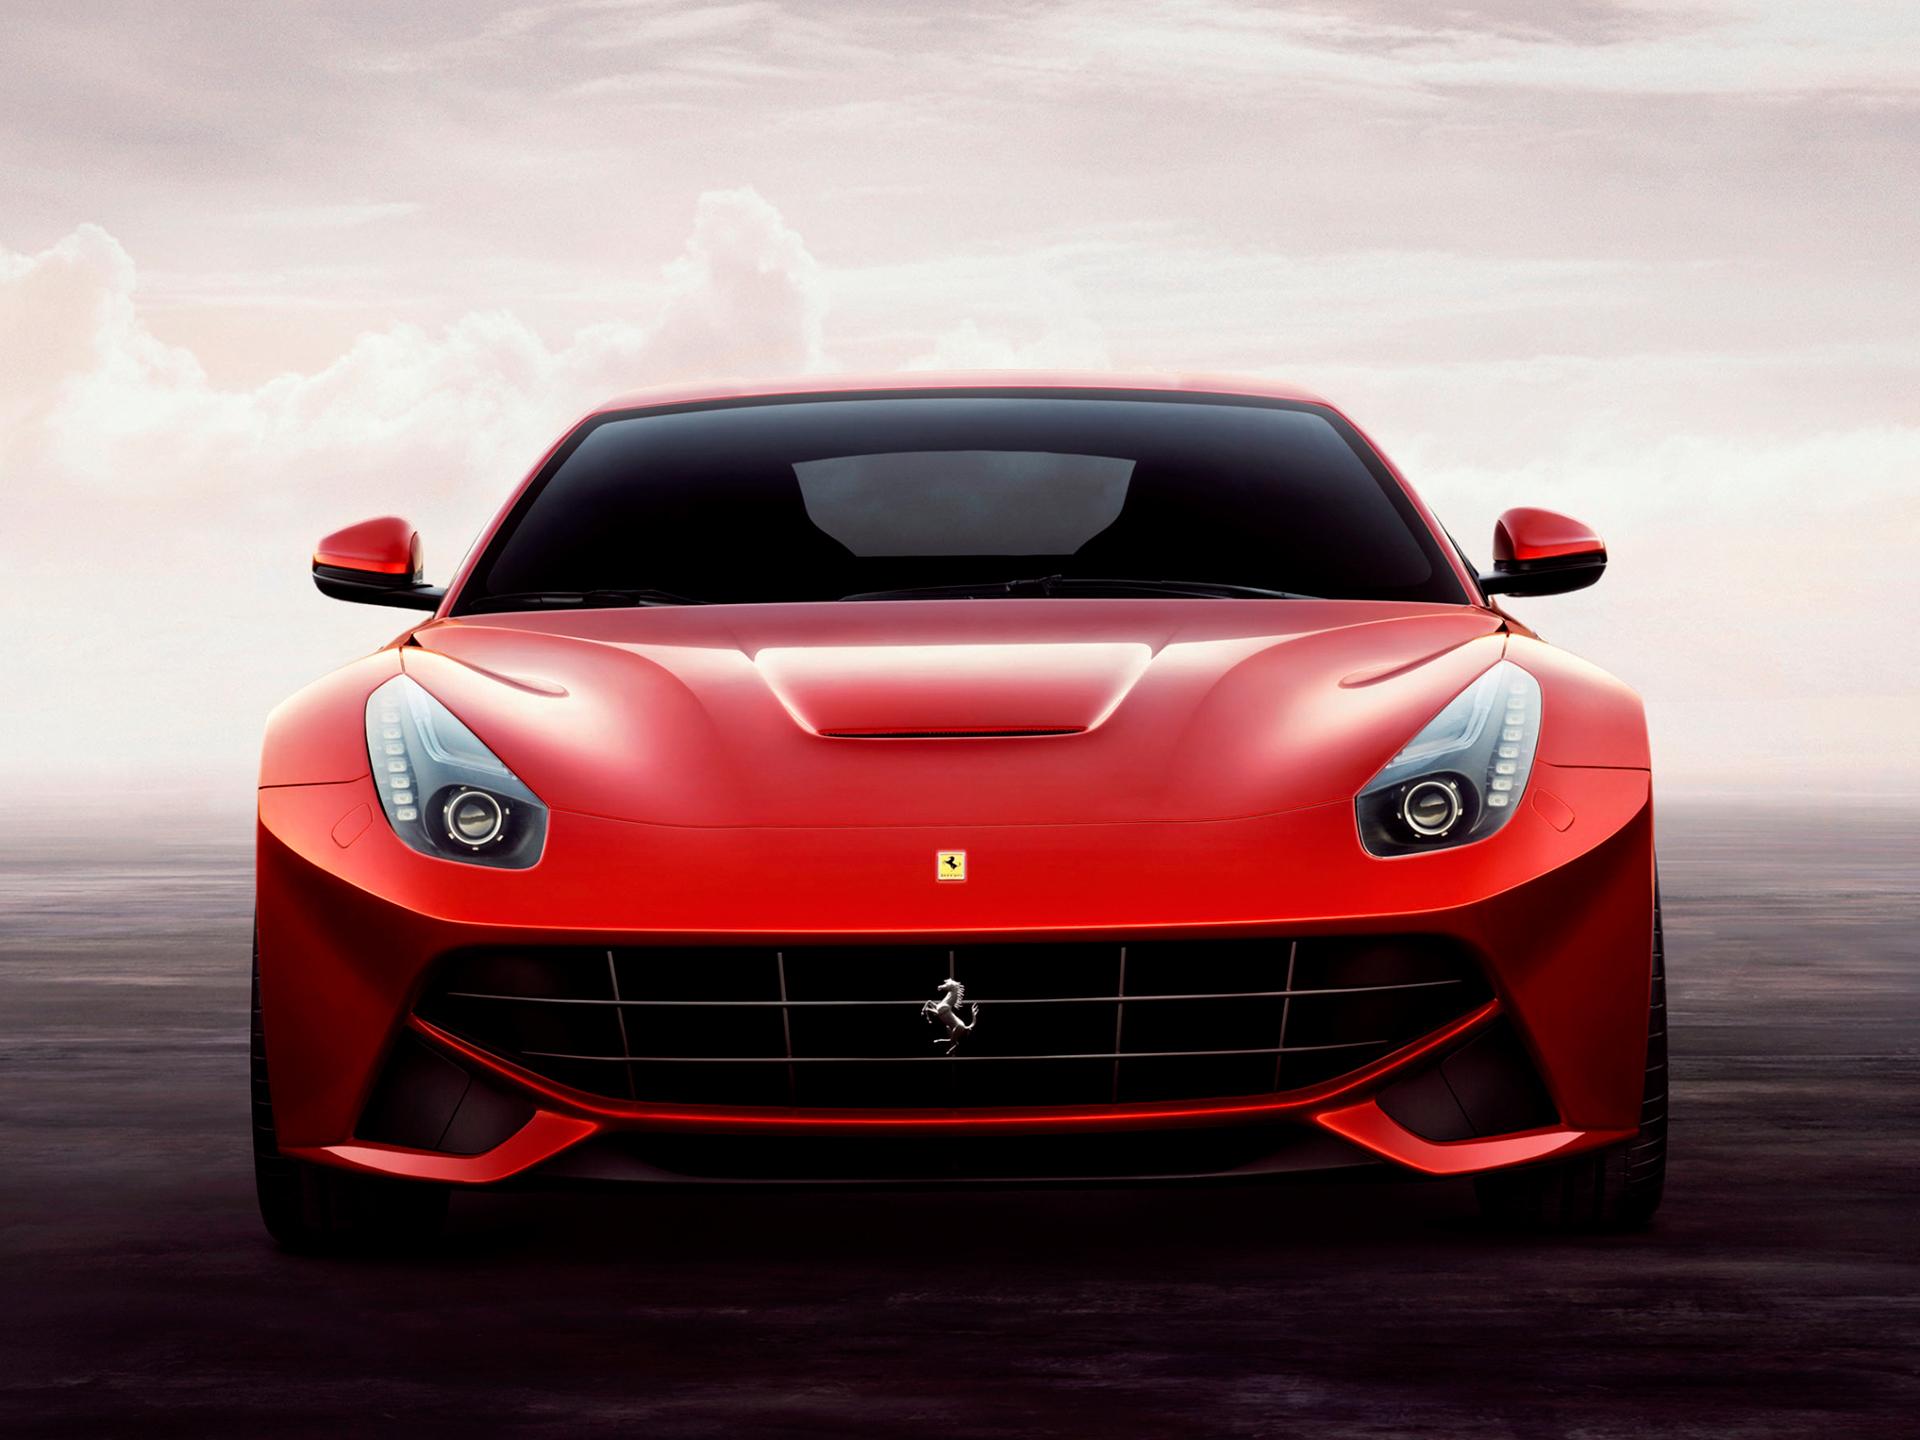 Ferrari F12berlinetta - avant / front